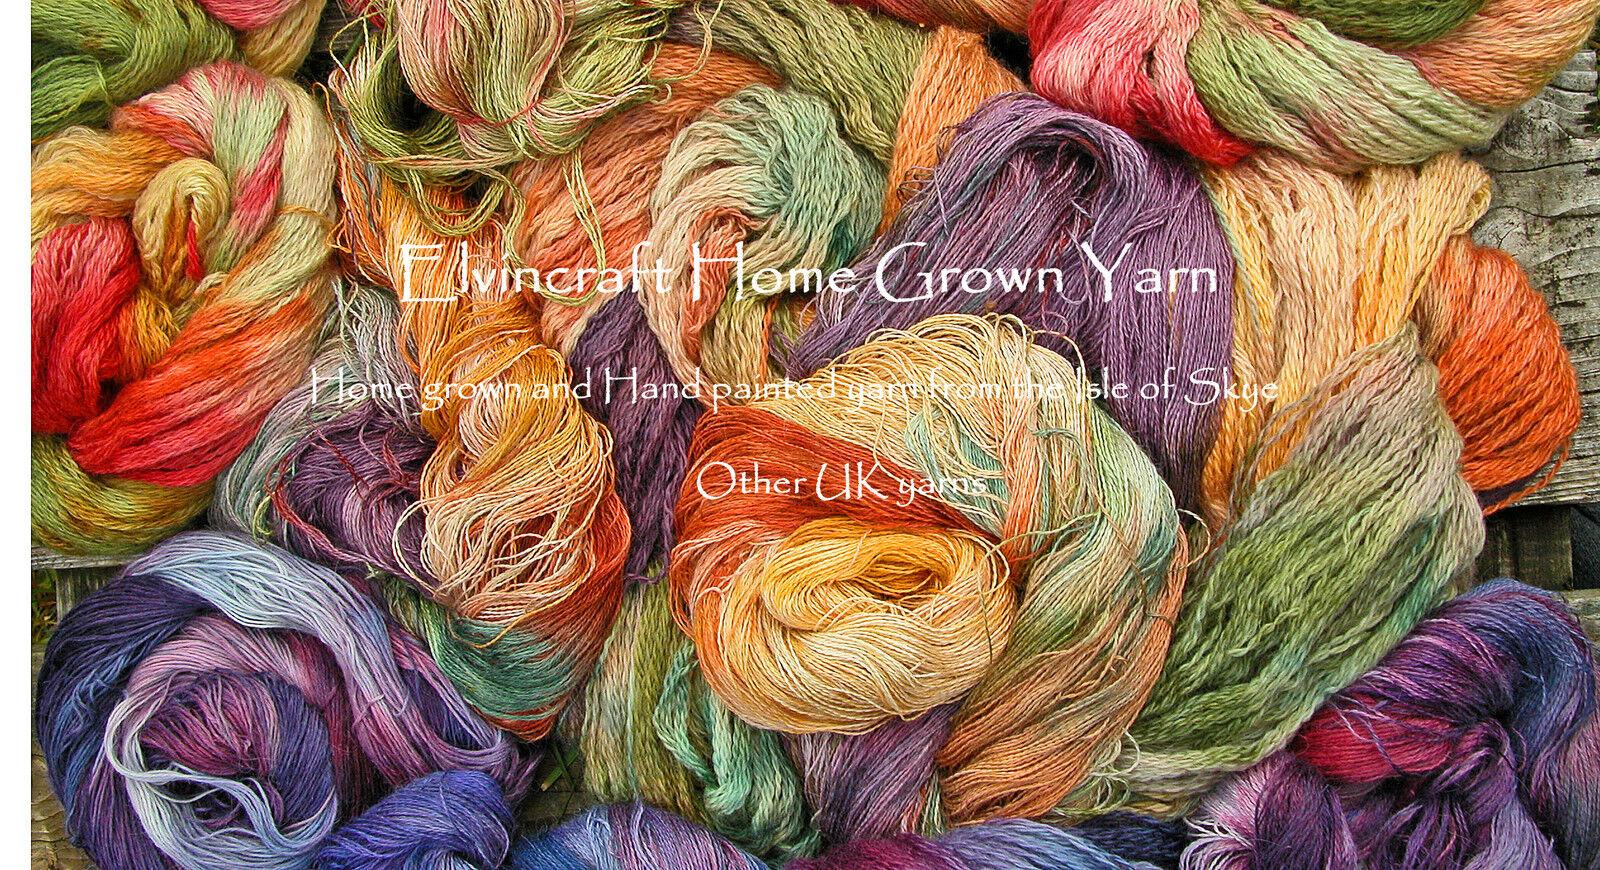 Elvincraft Yarns